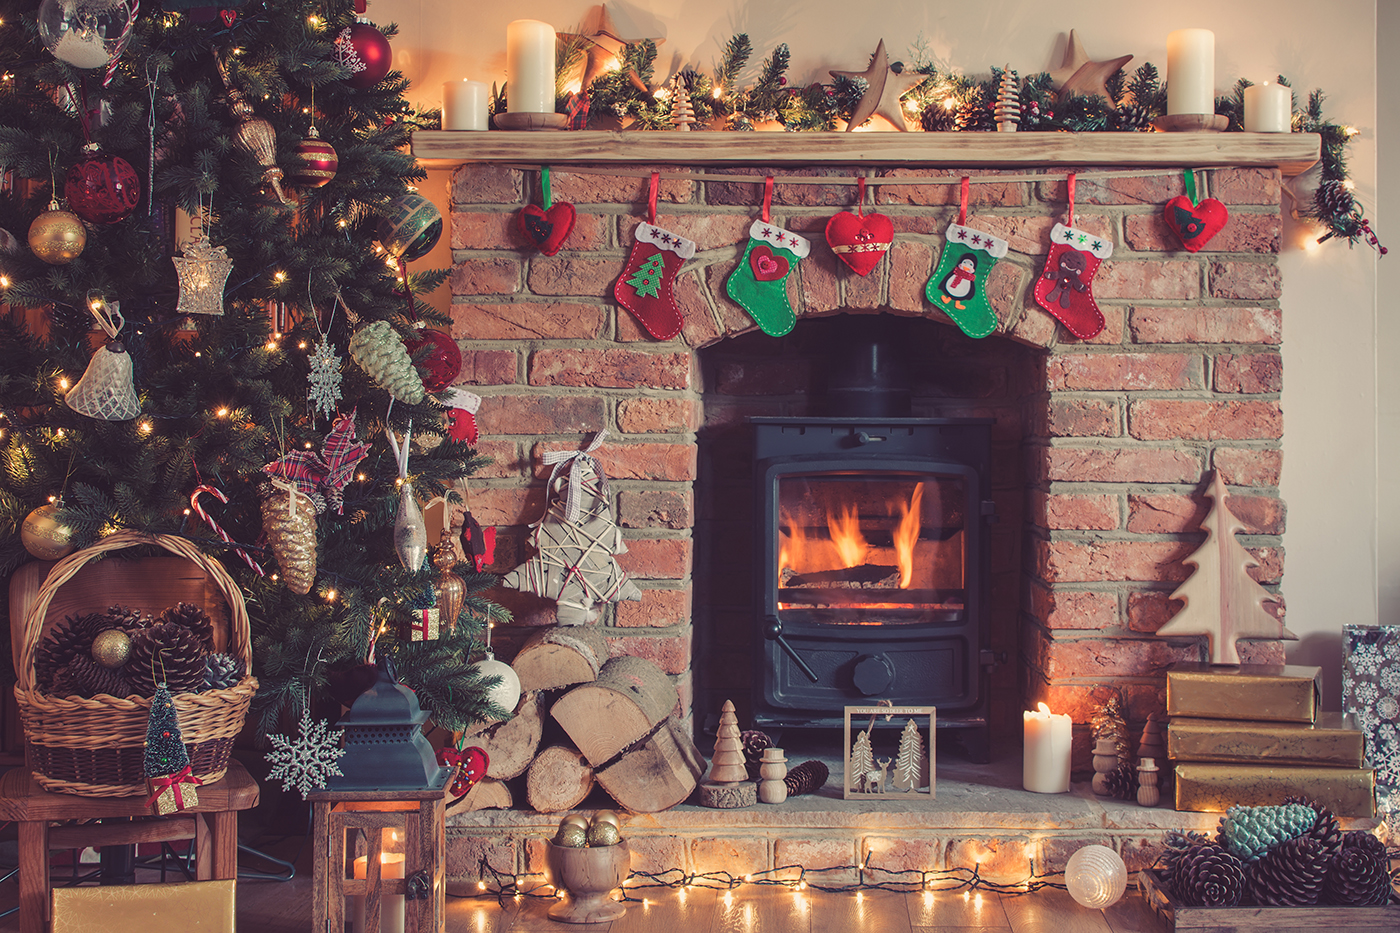 Top Fireplace Decorating Tips